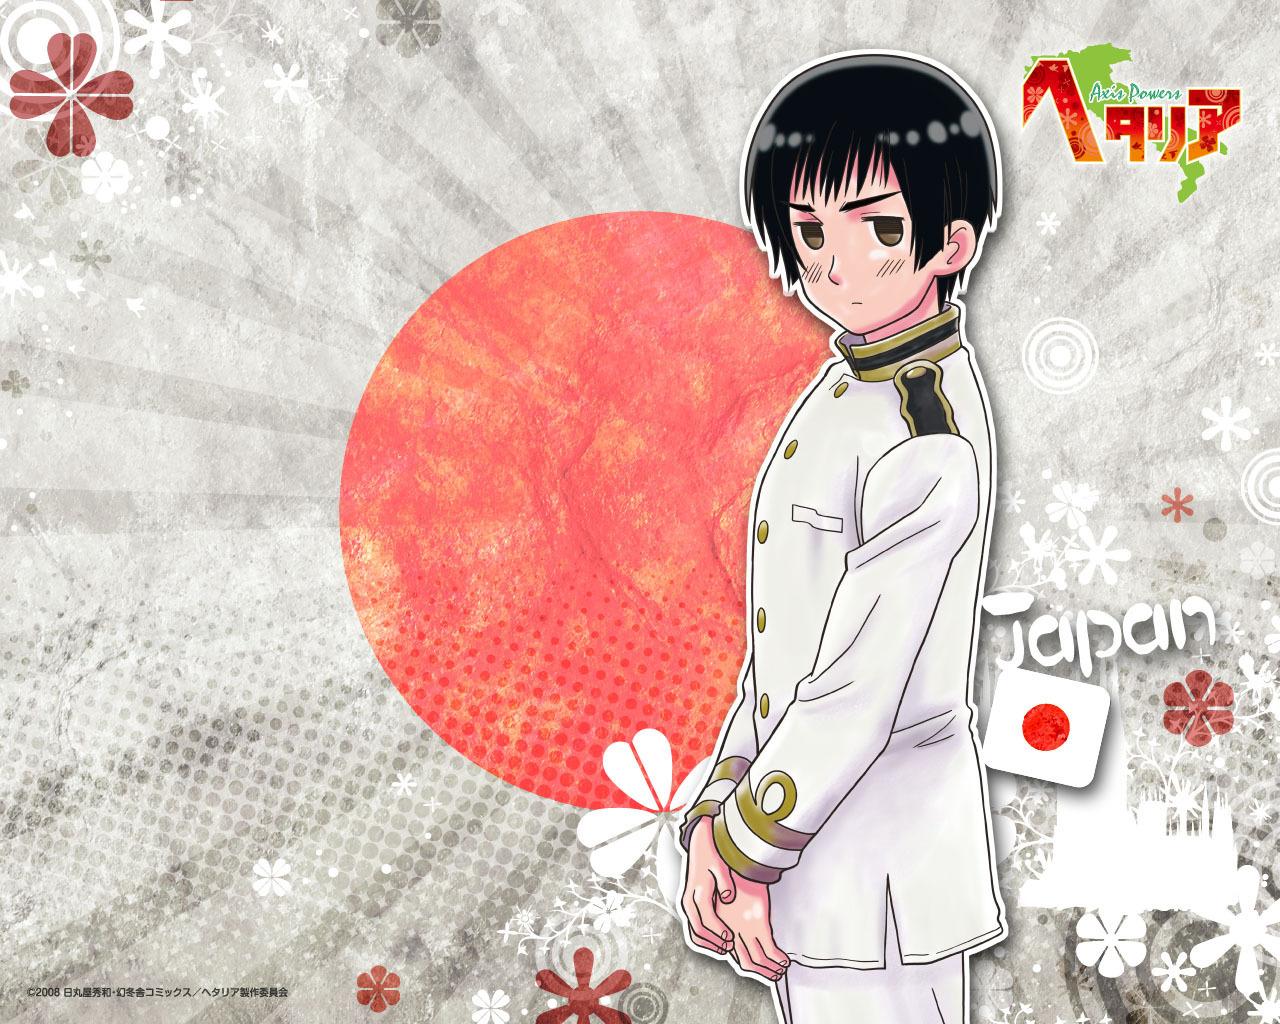 http://3.bp.blogspot.com/_2n9G8hS3AbI/TU4Owo5tQxI/AAAAAAAACWc/g56C2eitJeA/s1600/Axis+Hetalia+Power+Japan+Wallpaper.jpg